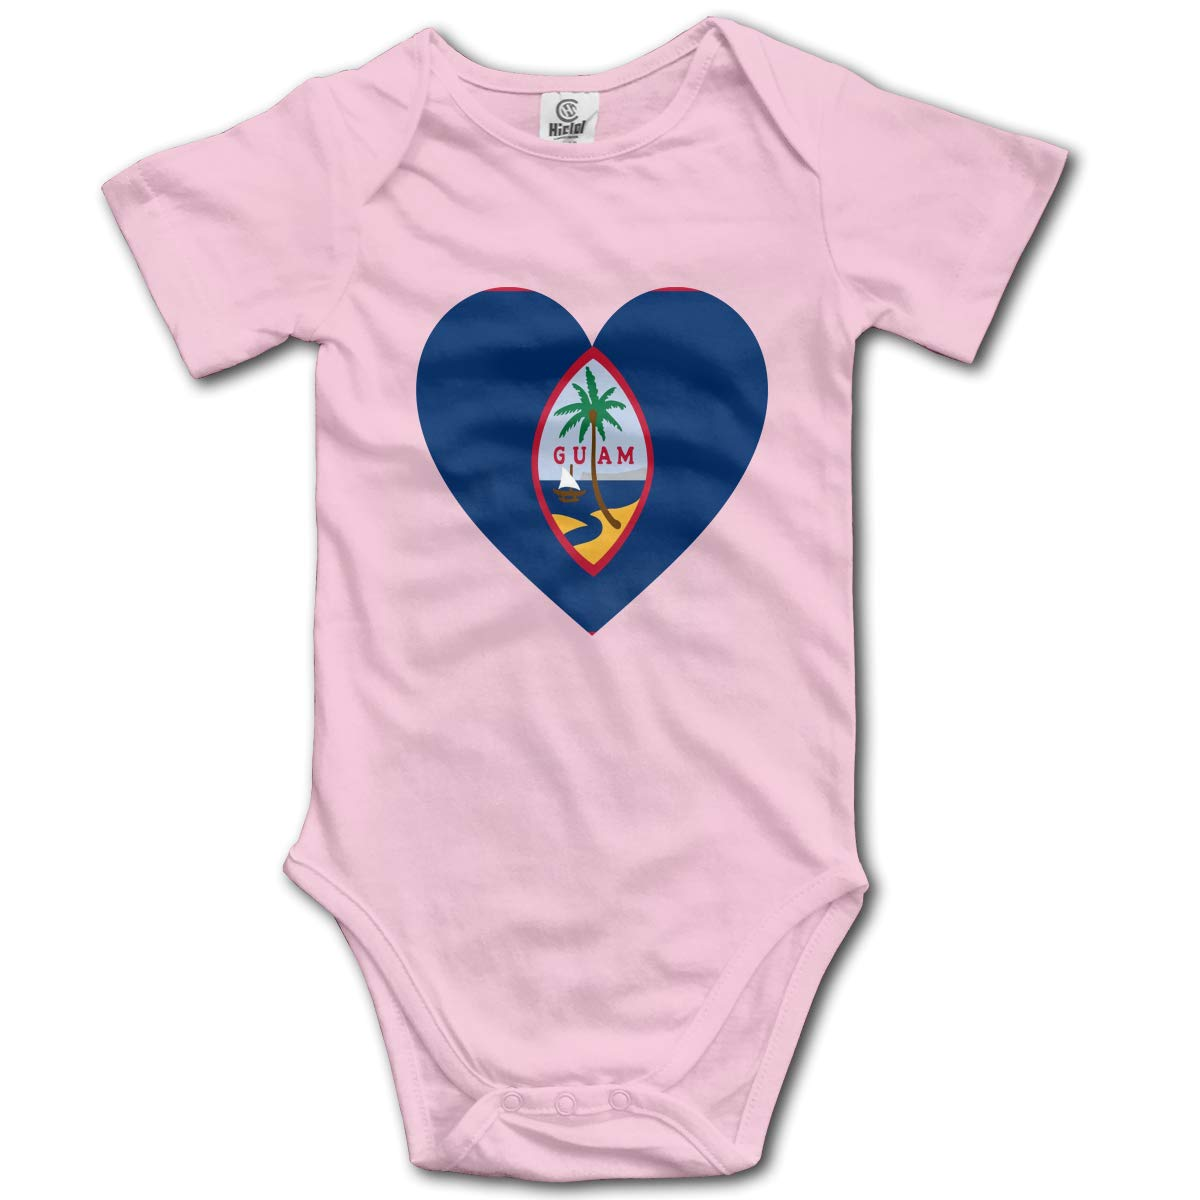 Baby Short-Sleeve Onesies Love Guam Flag Bodysuit Baby Outfits